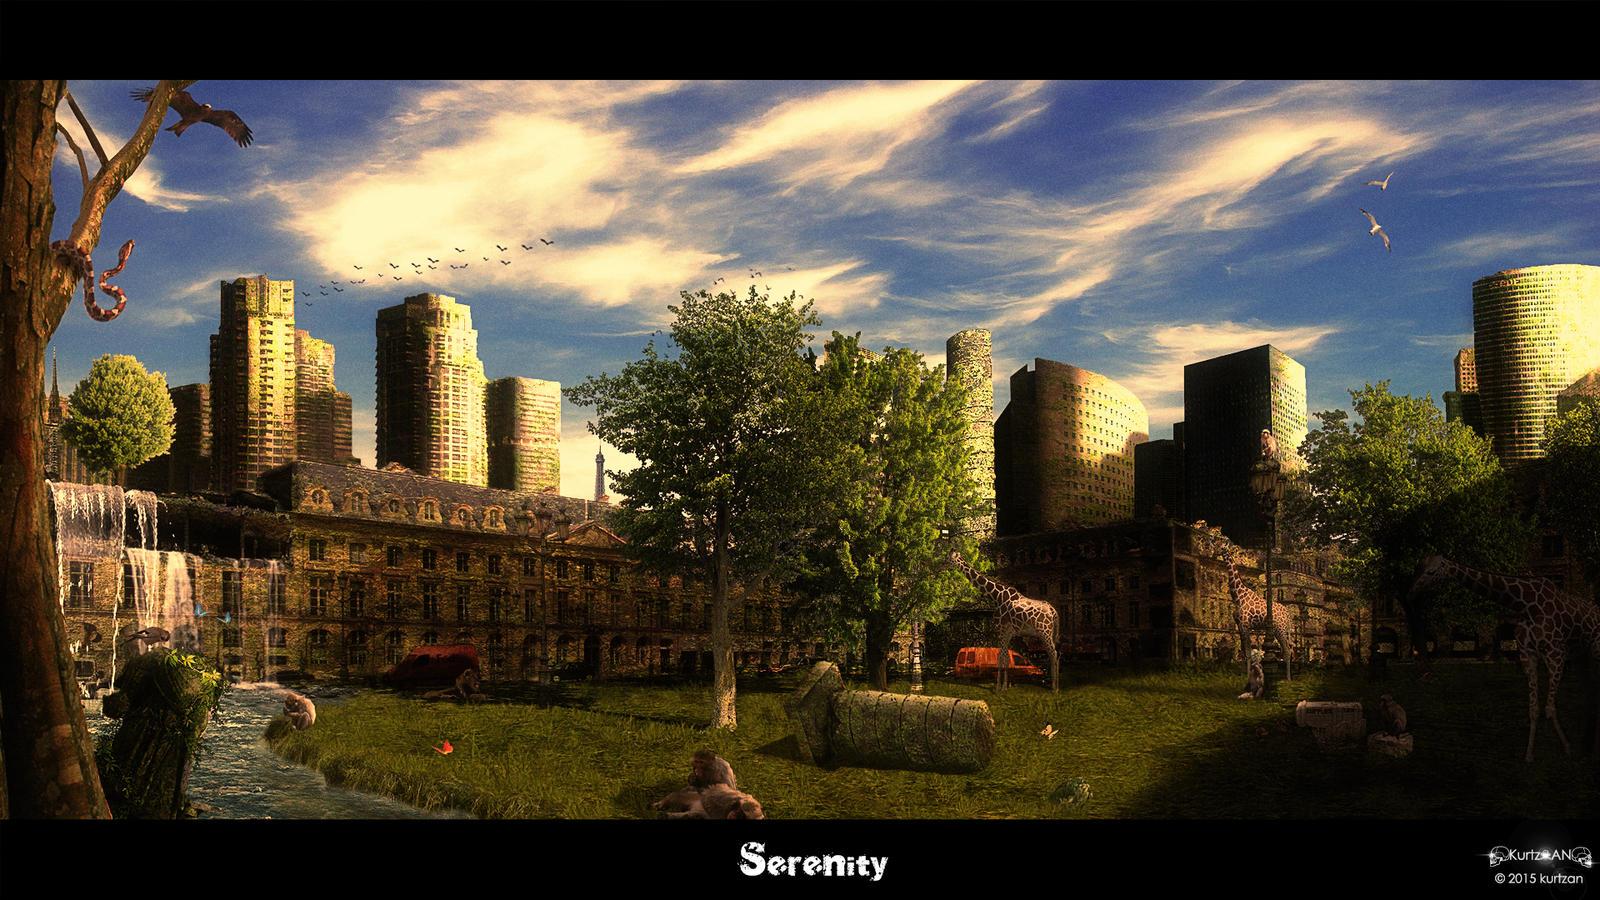 Serenity by Kurtzan